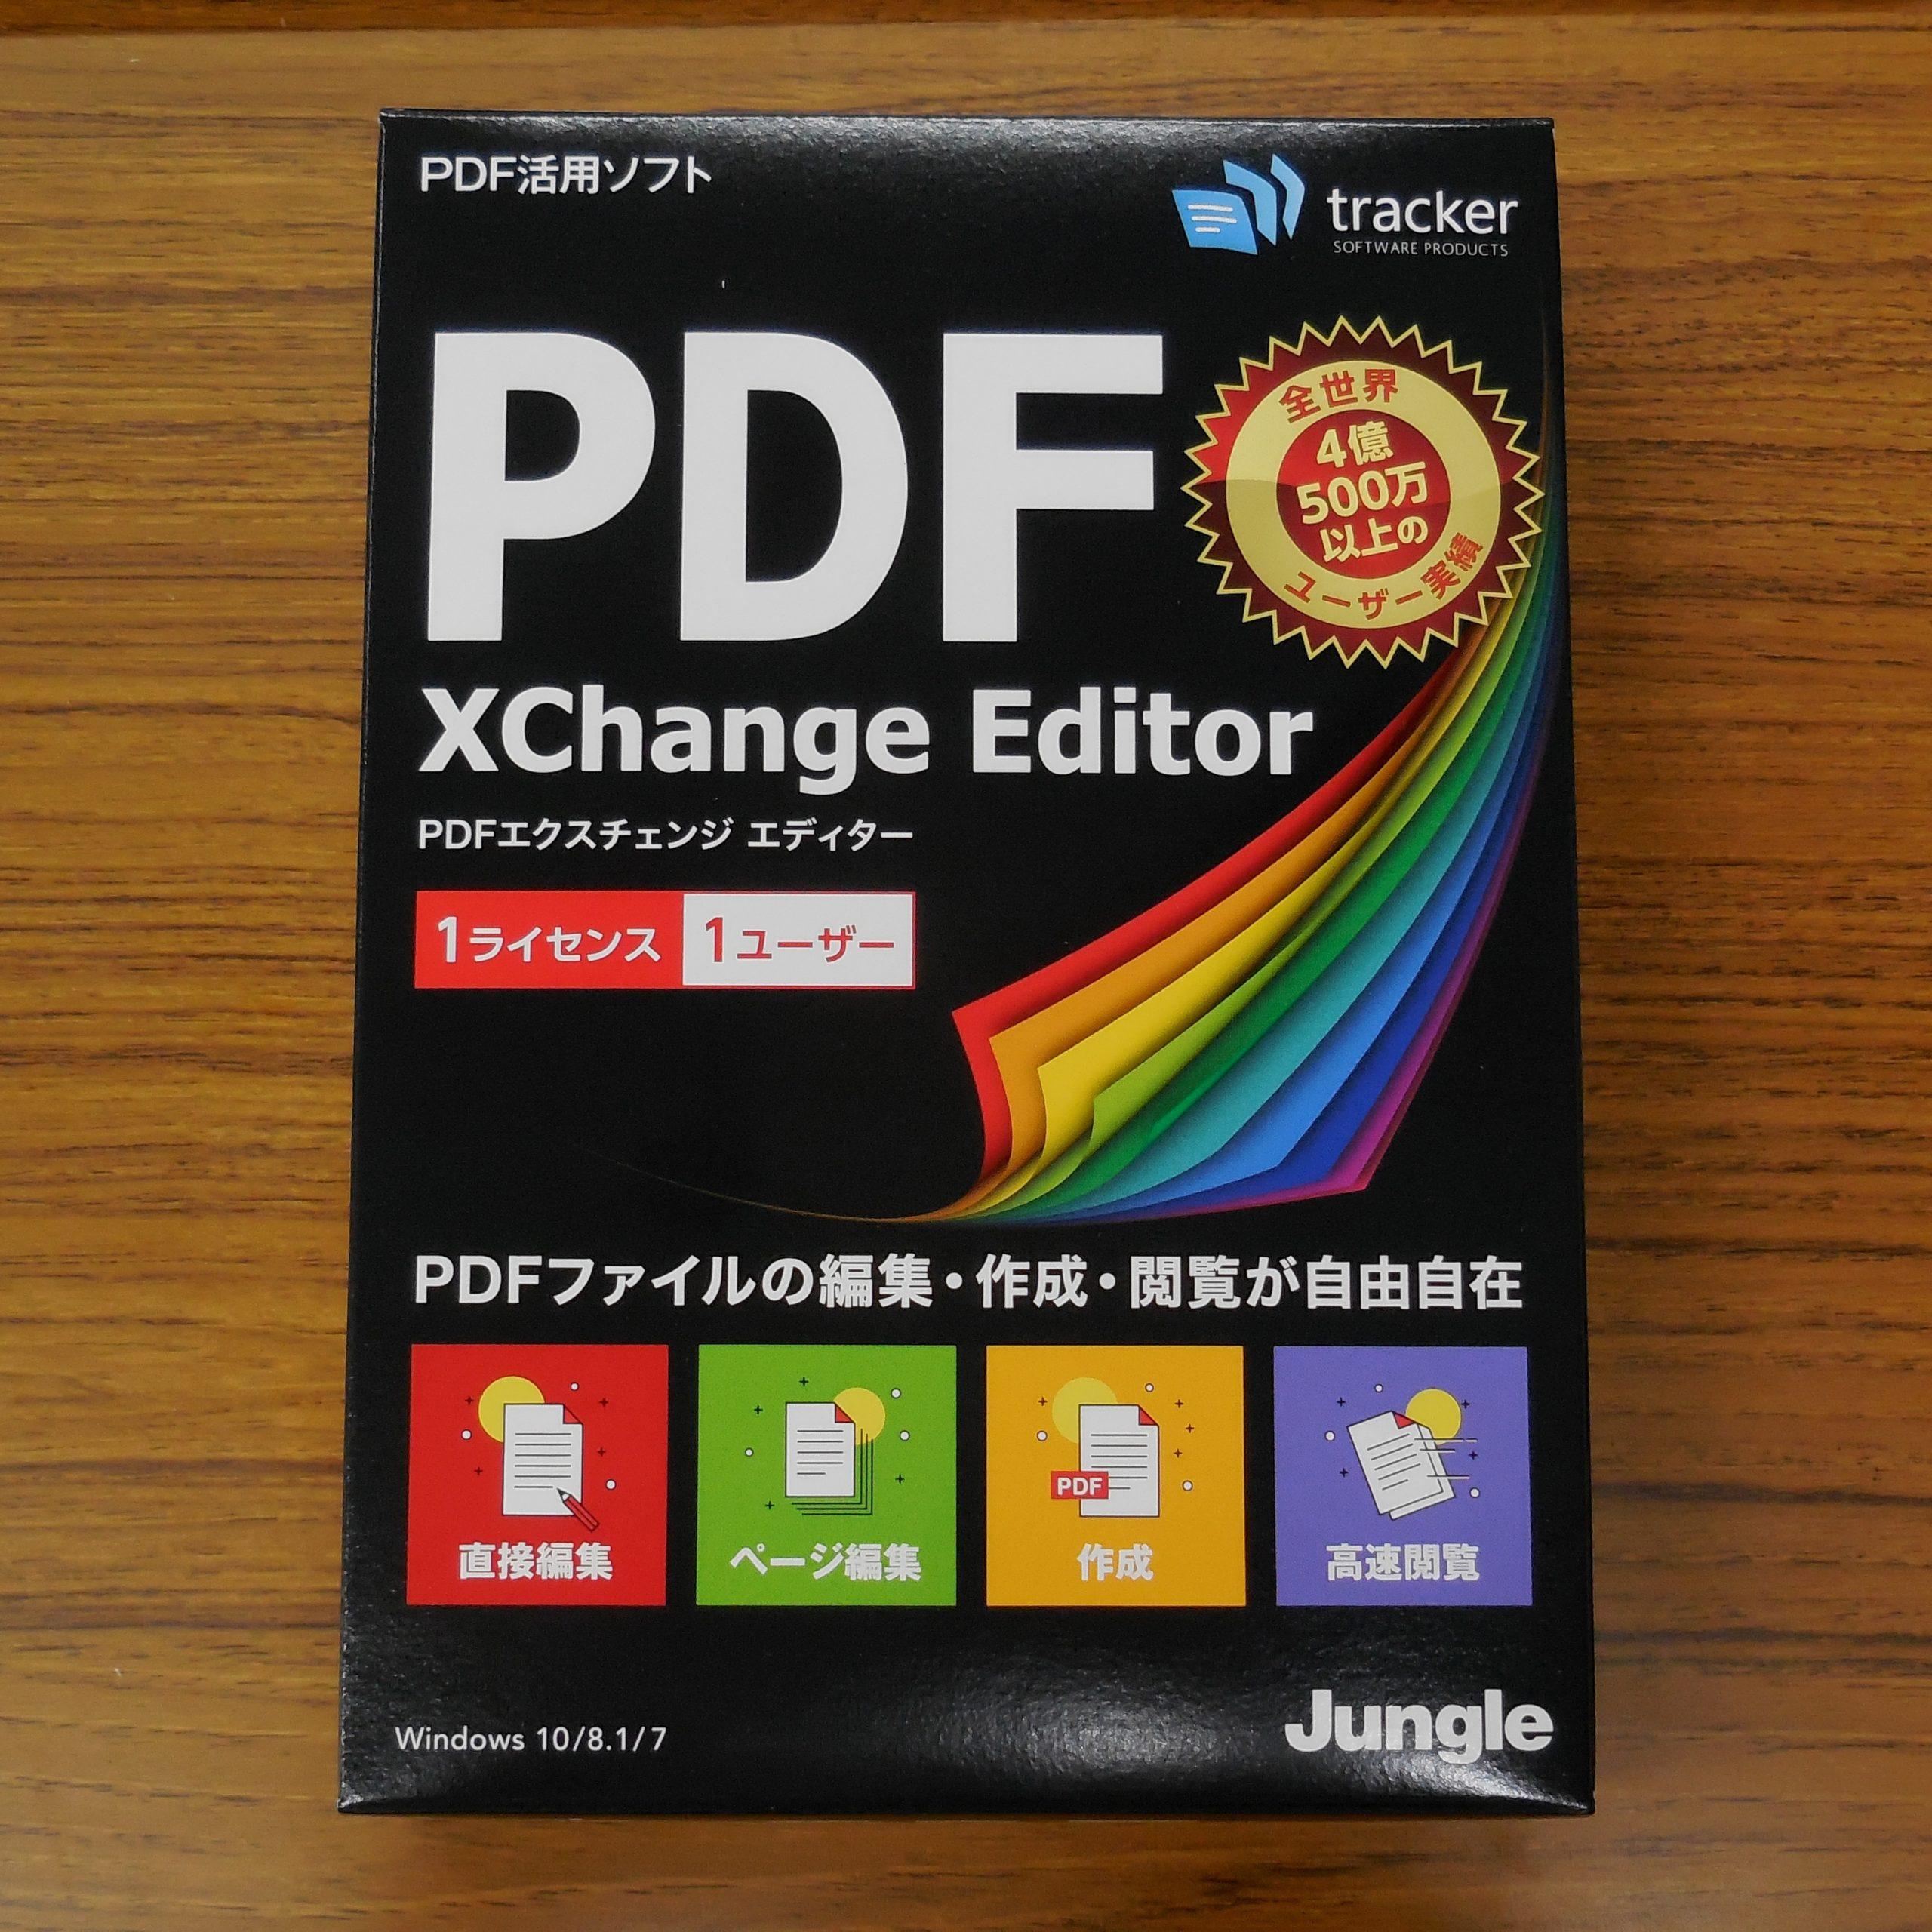 PDF-XChange Editor内容物